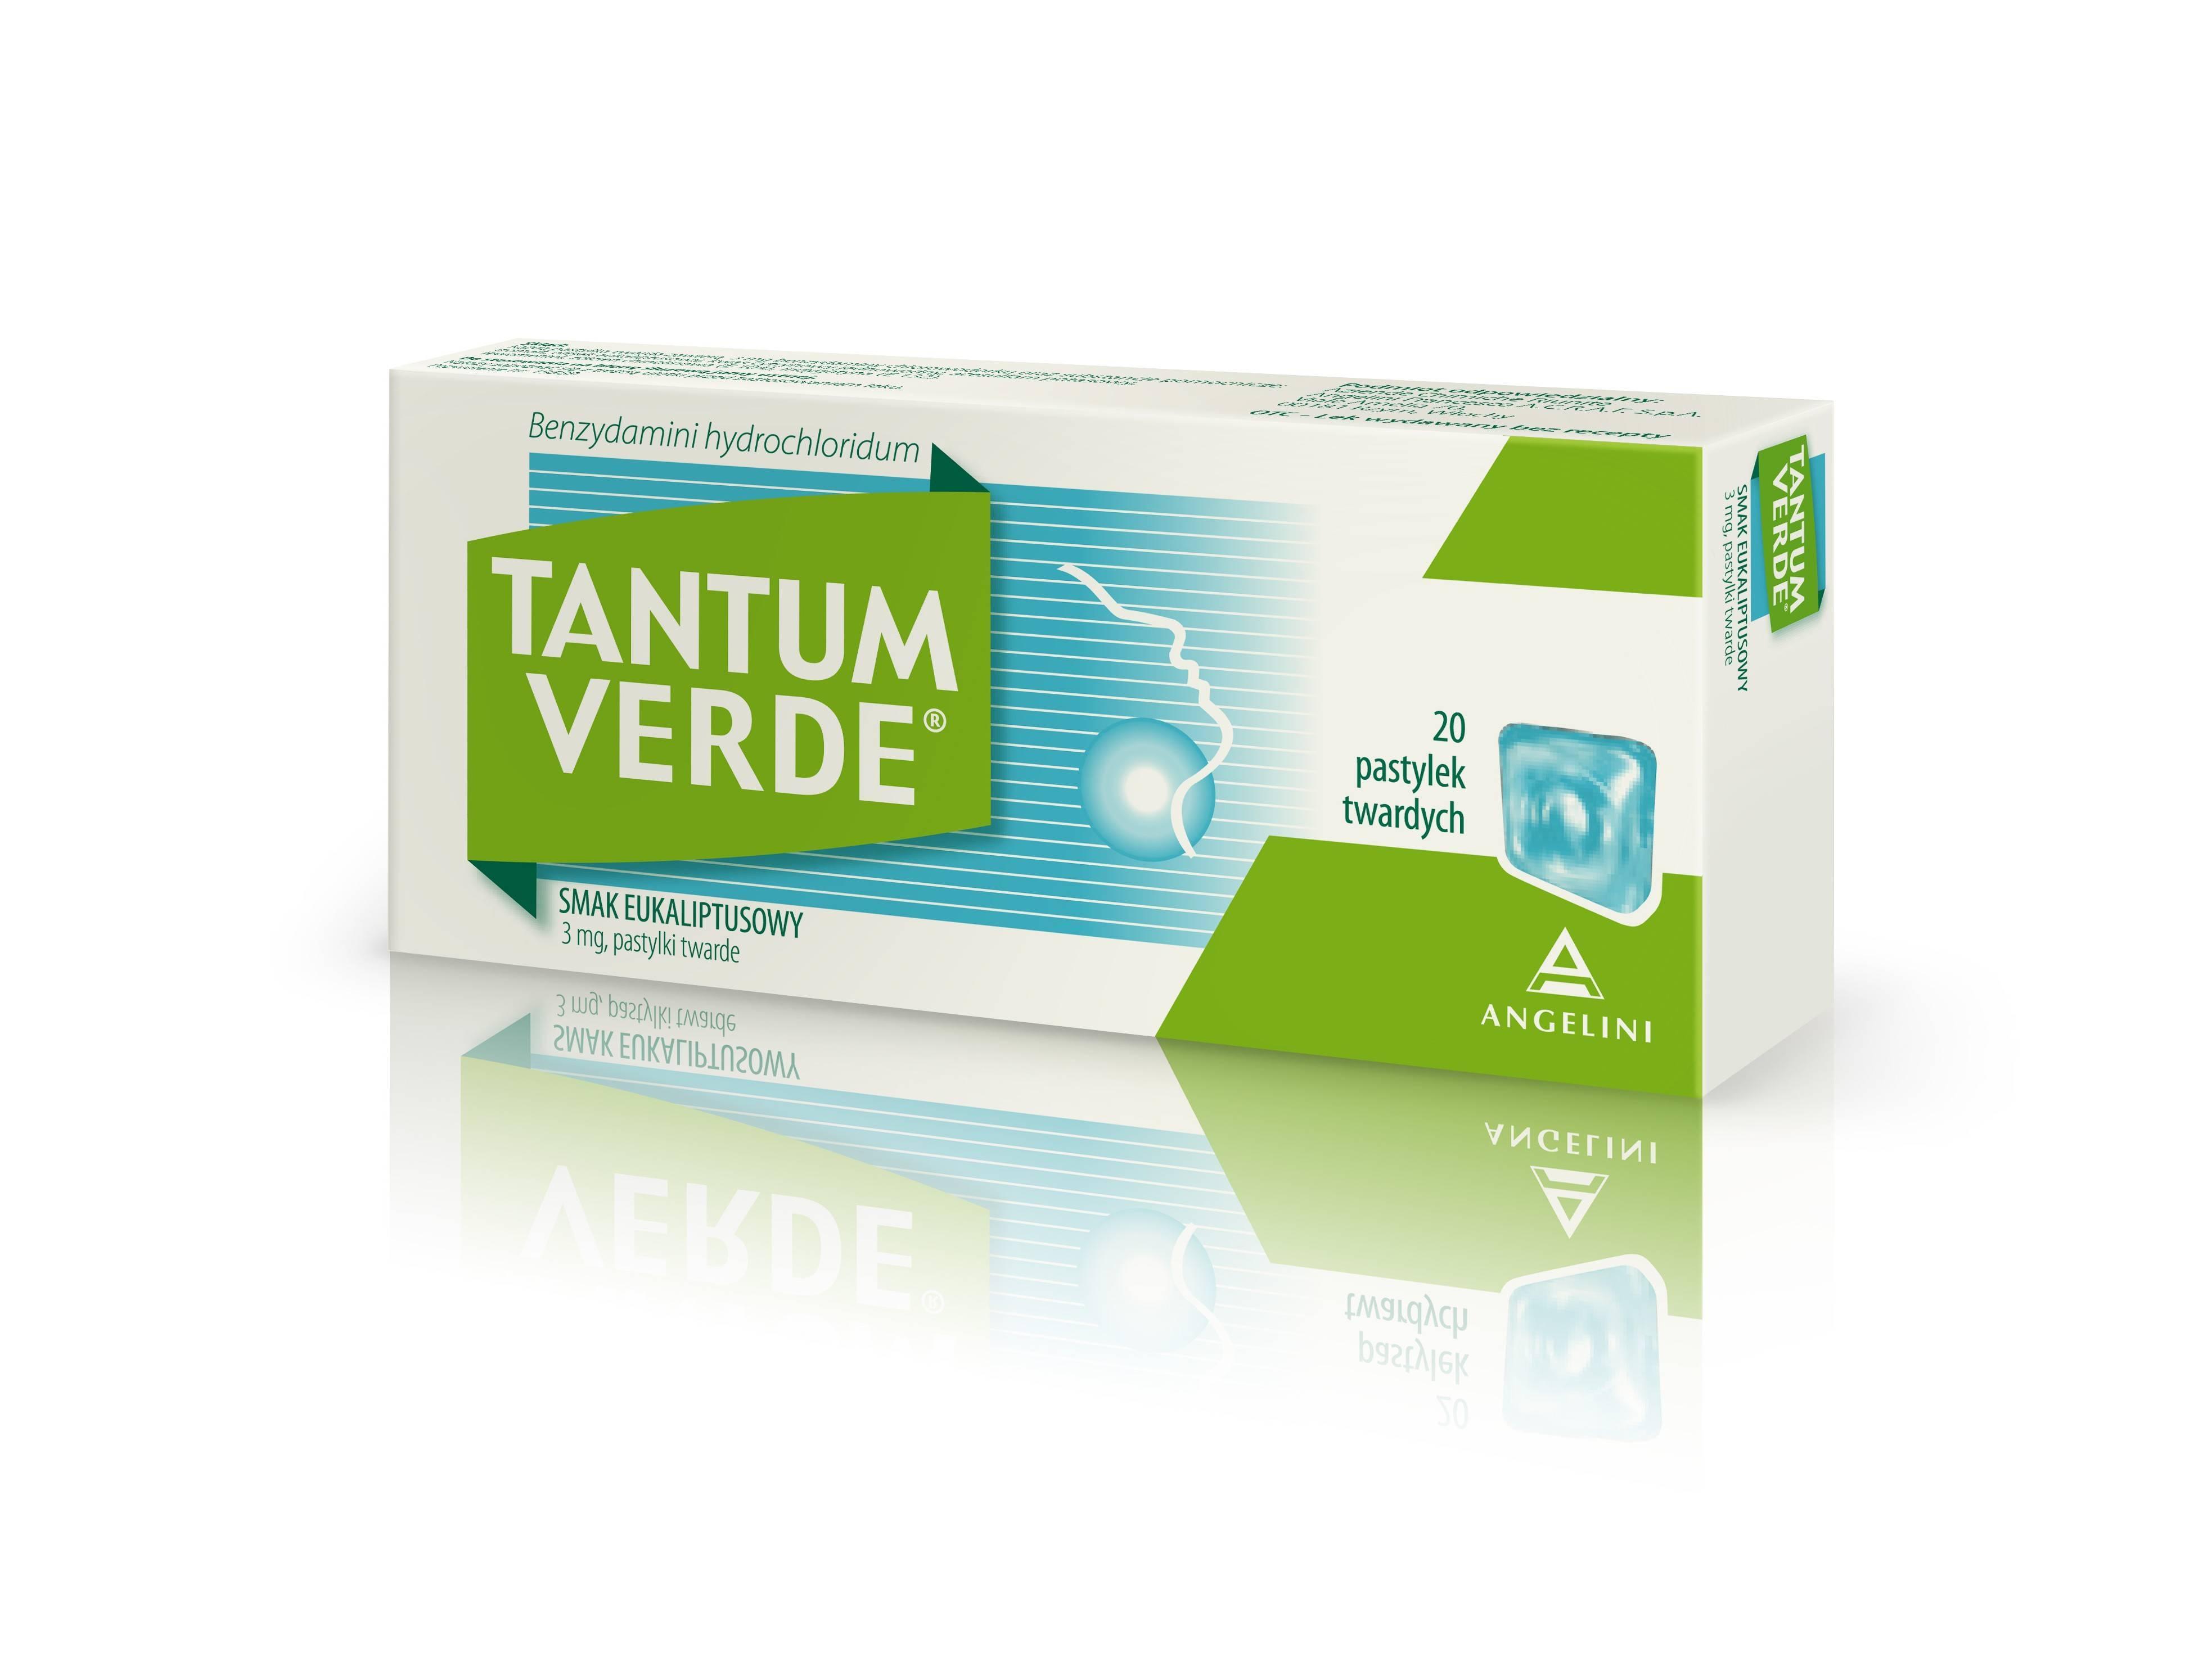 Тантум верде при беременности 2 триместр